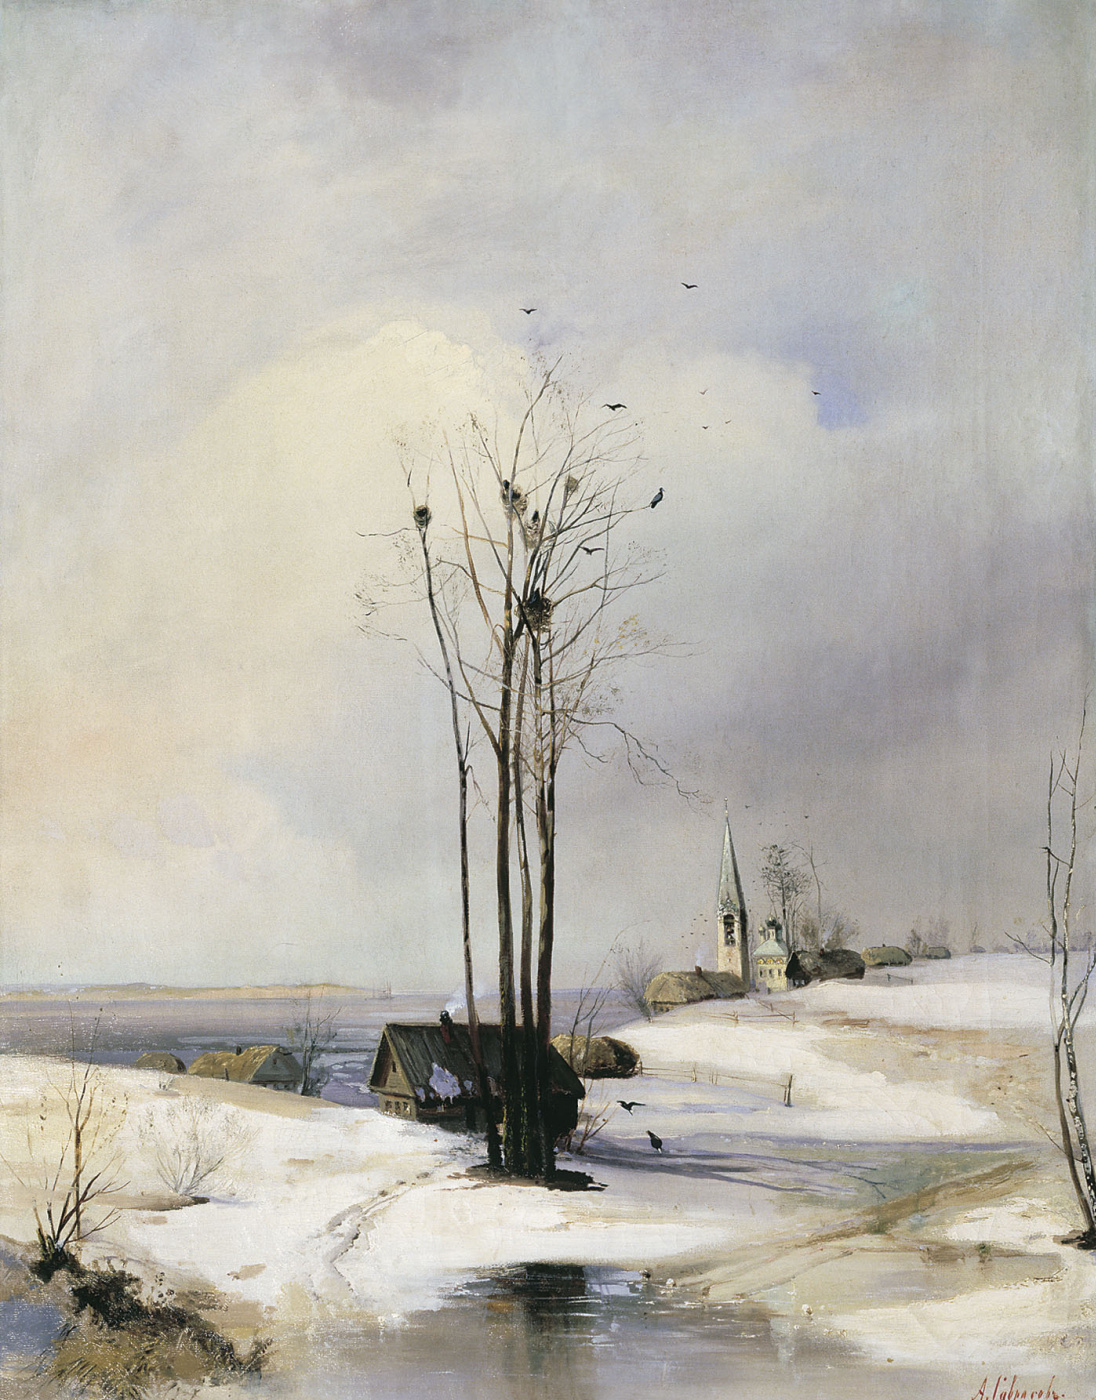 Alexey Savrasov. Early spring. Thaw